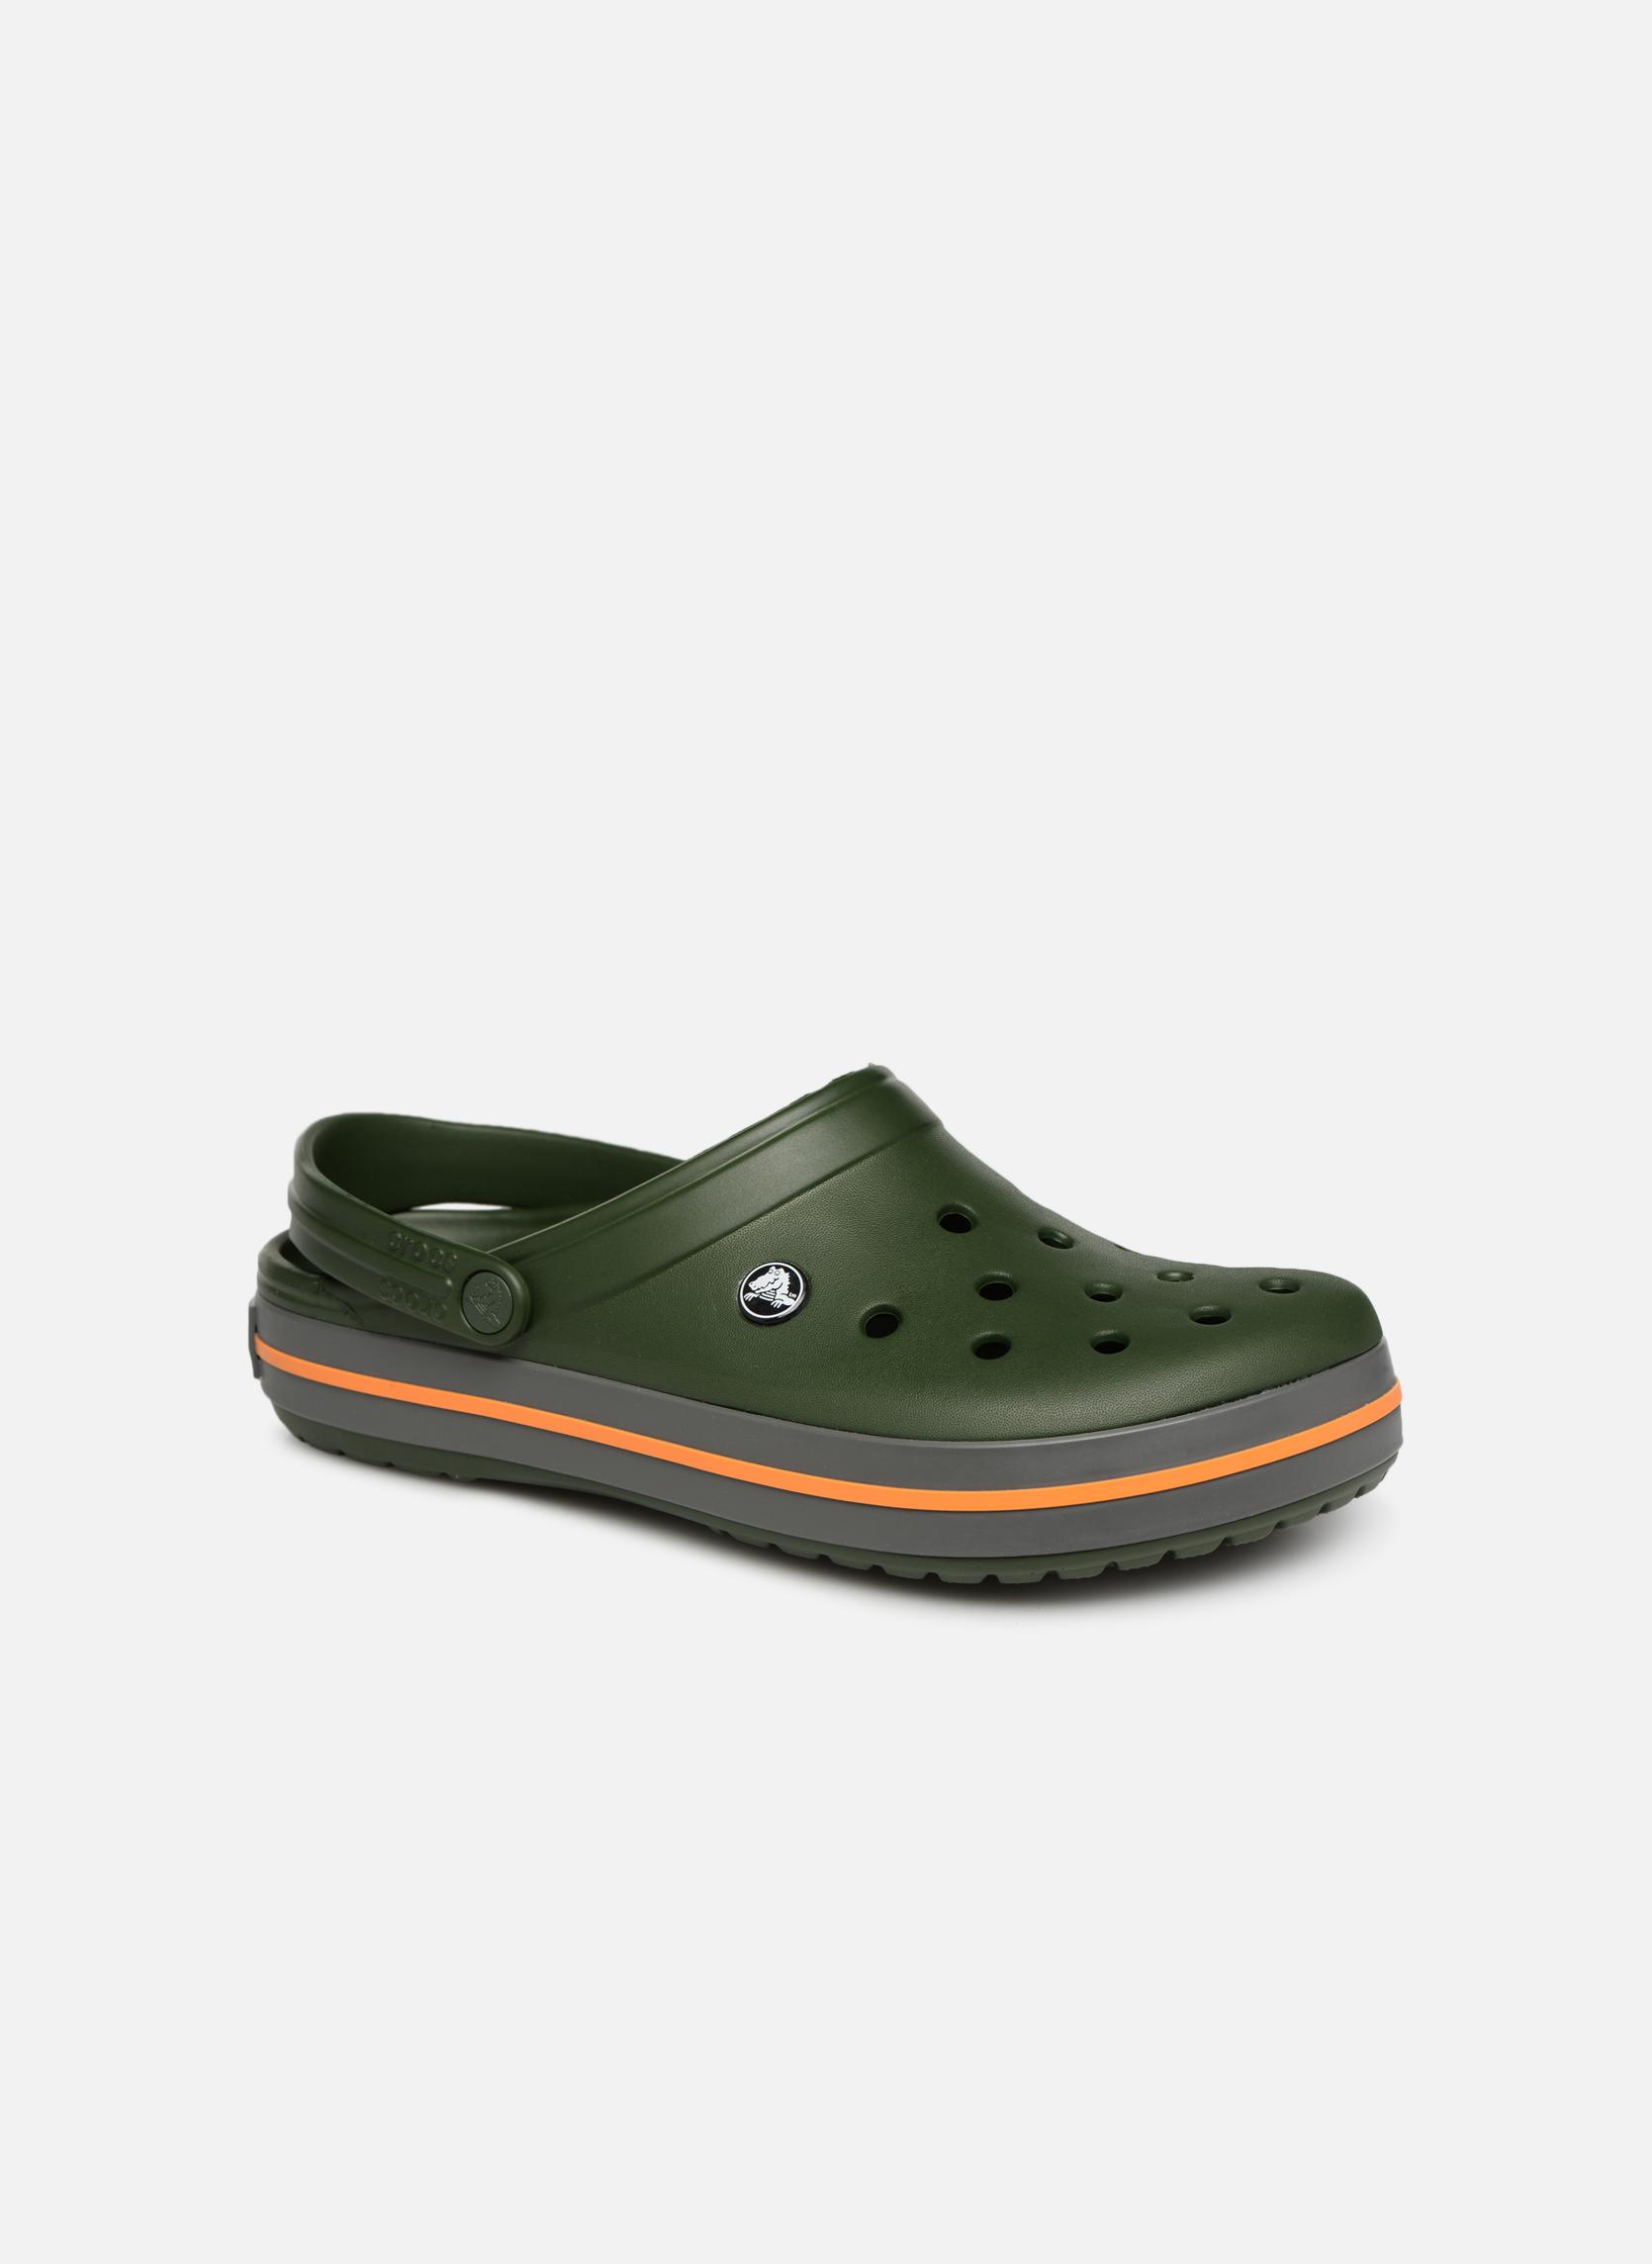 Crocs Crocband M (Vert) - Sandales et nu-pieds chez Sarenza (343011)